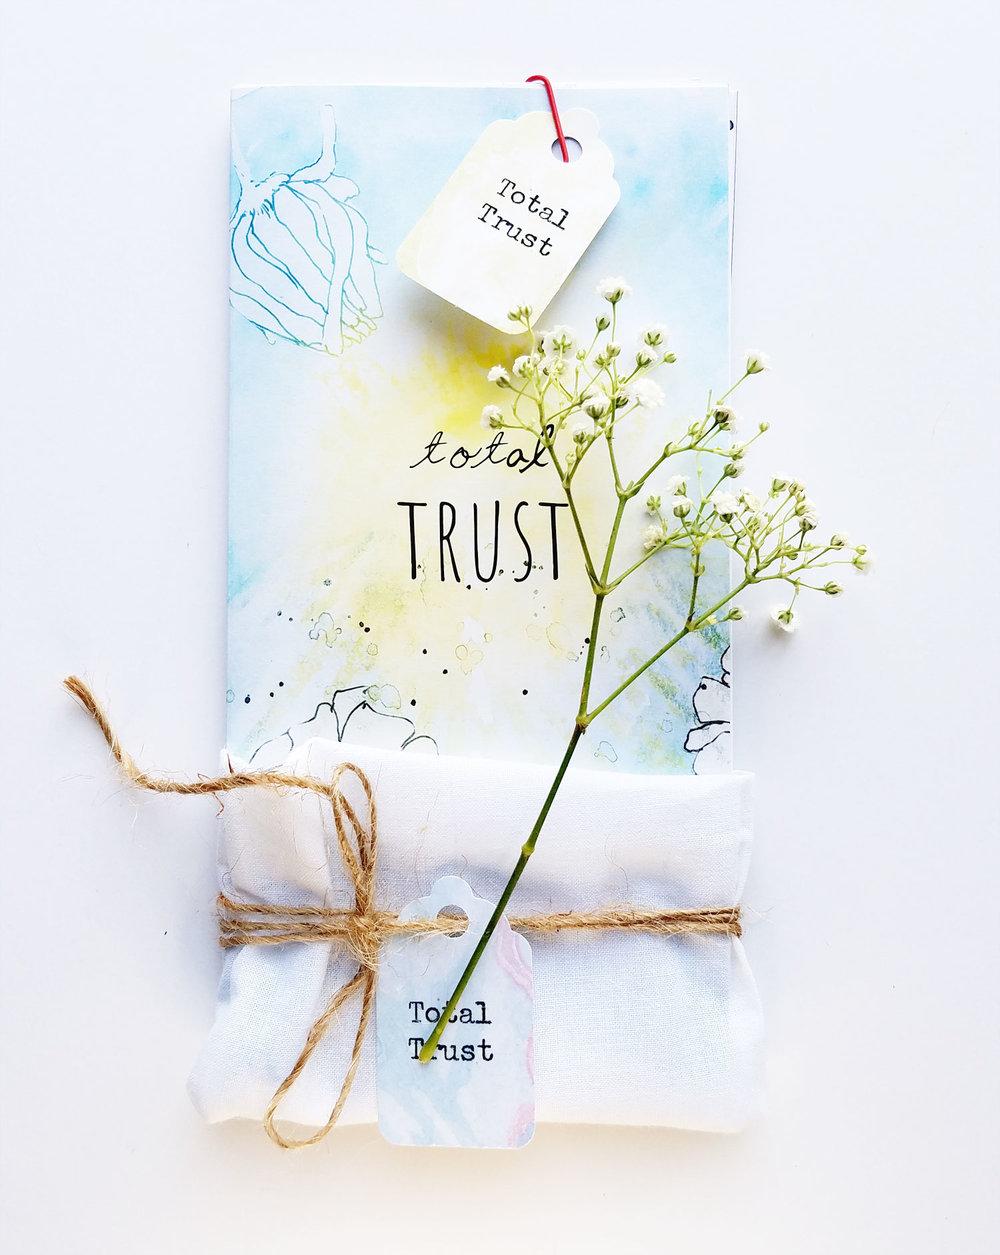 Total trust - creative devotional kit